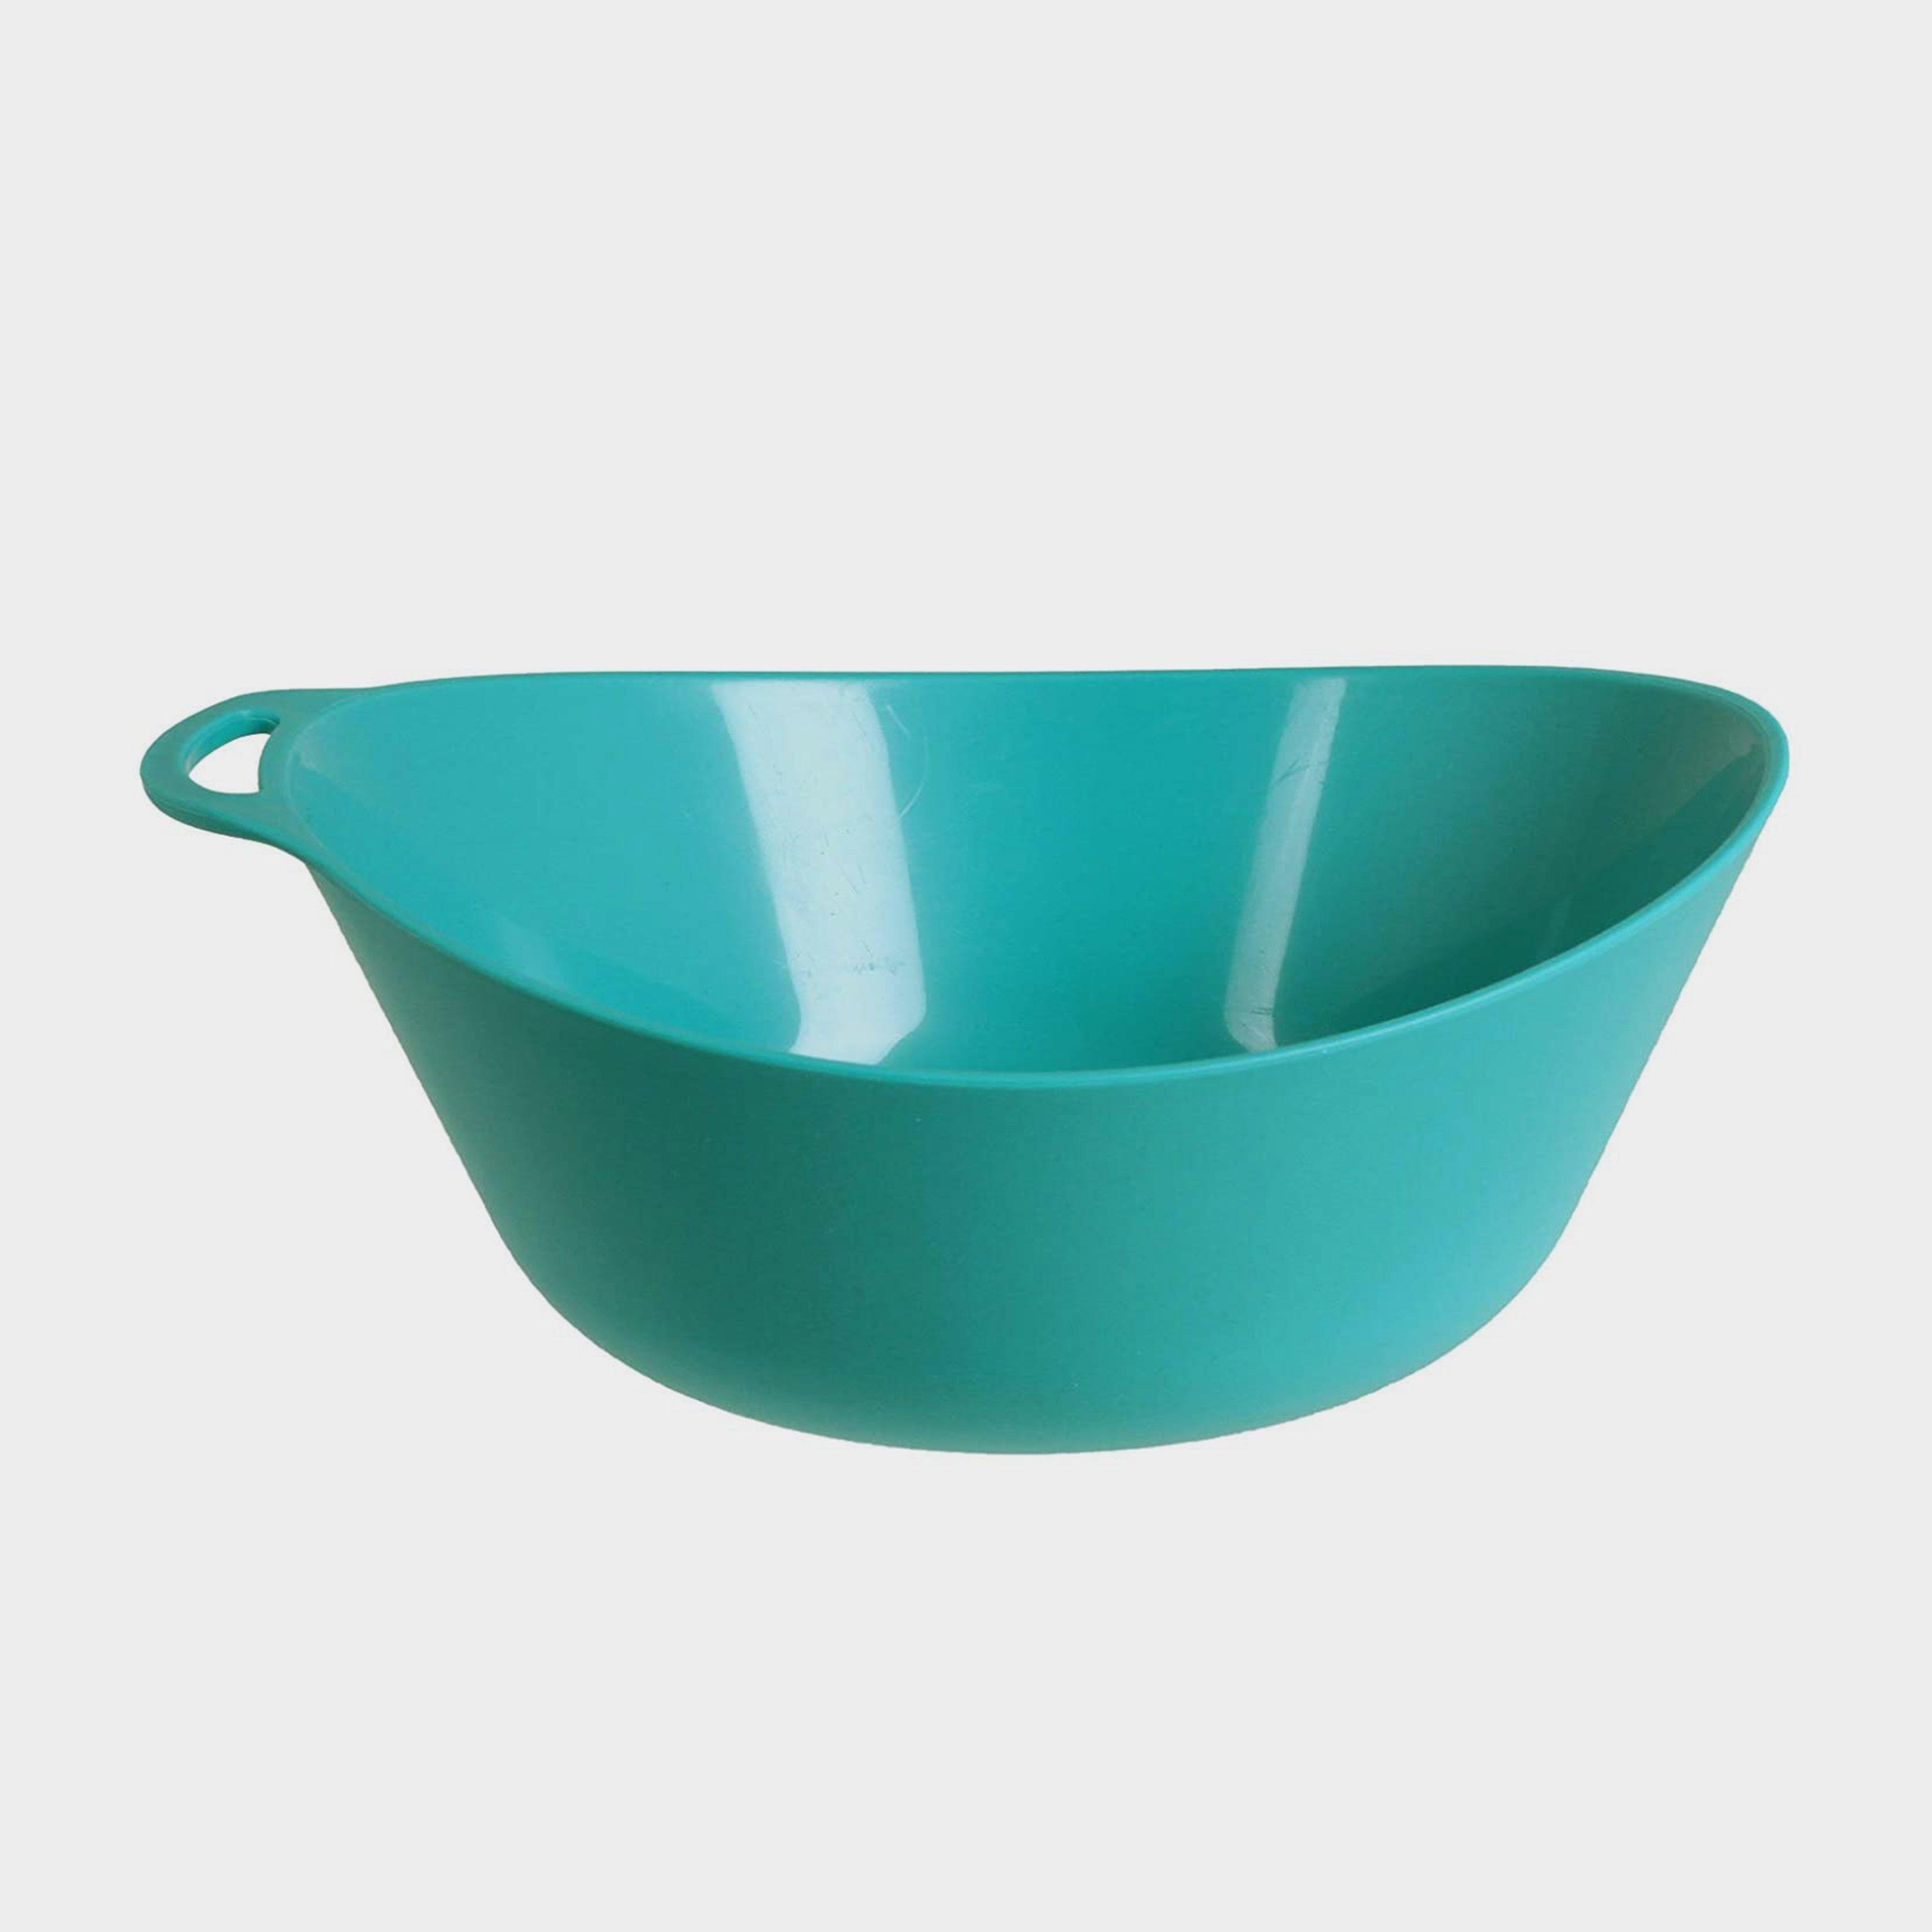 Lifeventure Ellipse Plastic Camping Bowl - Blue/blue  Blue/blue